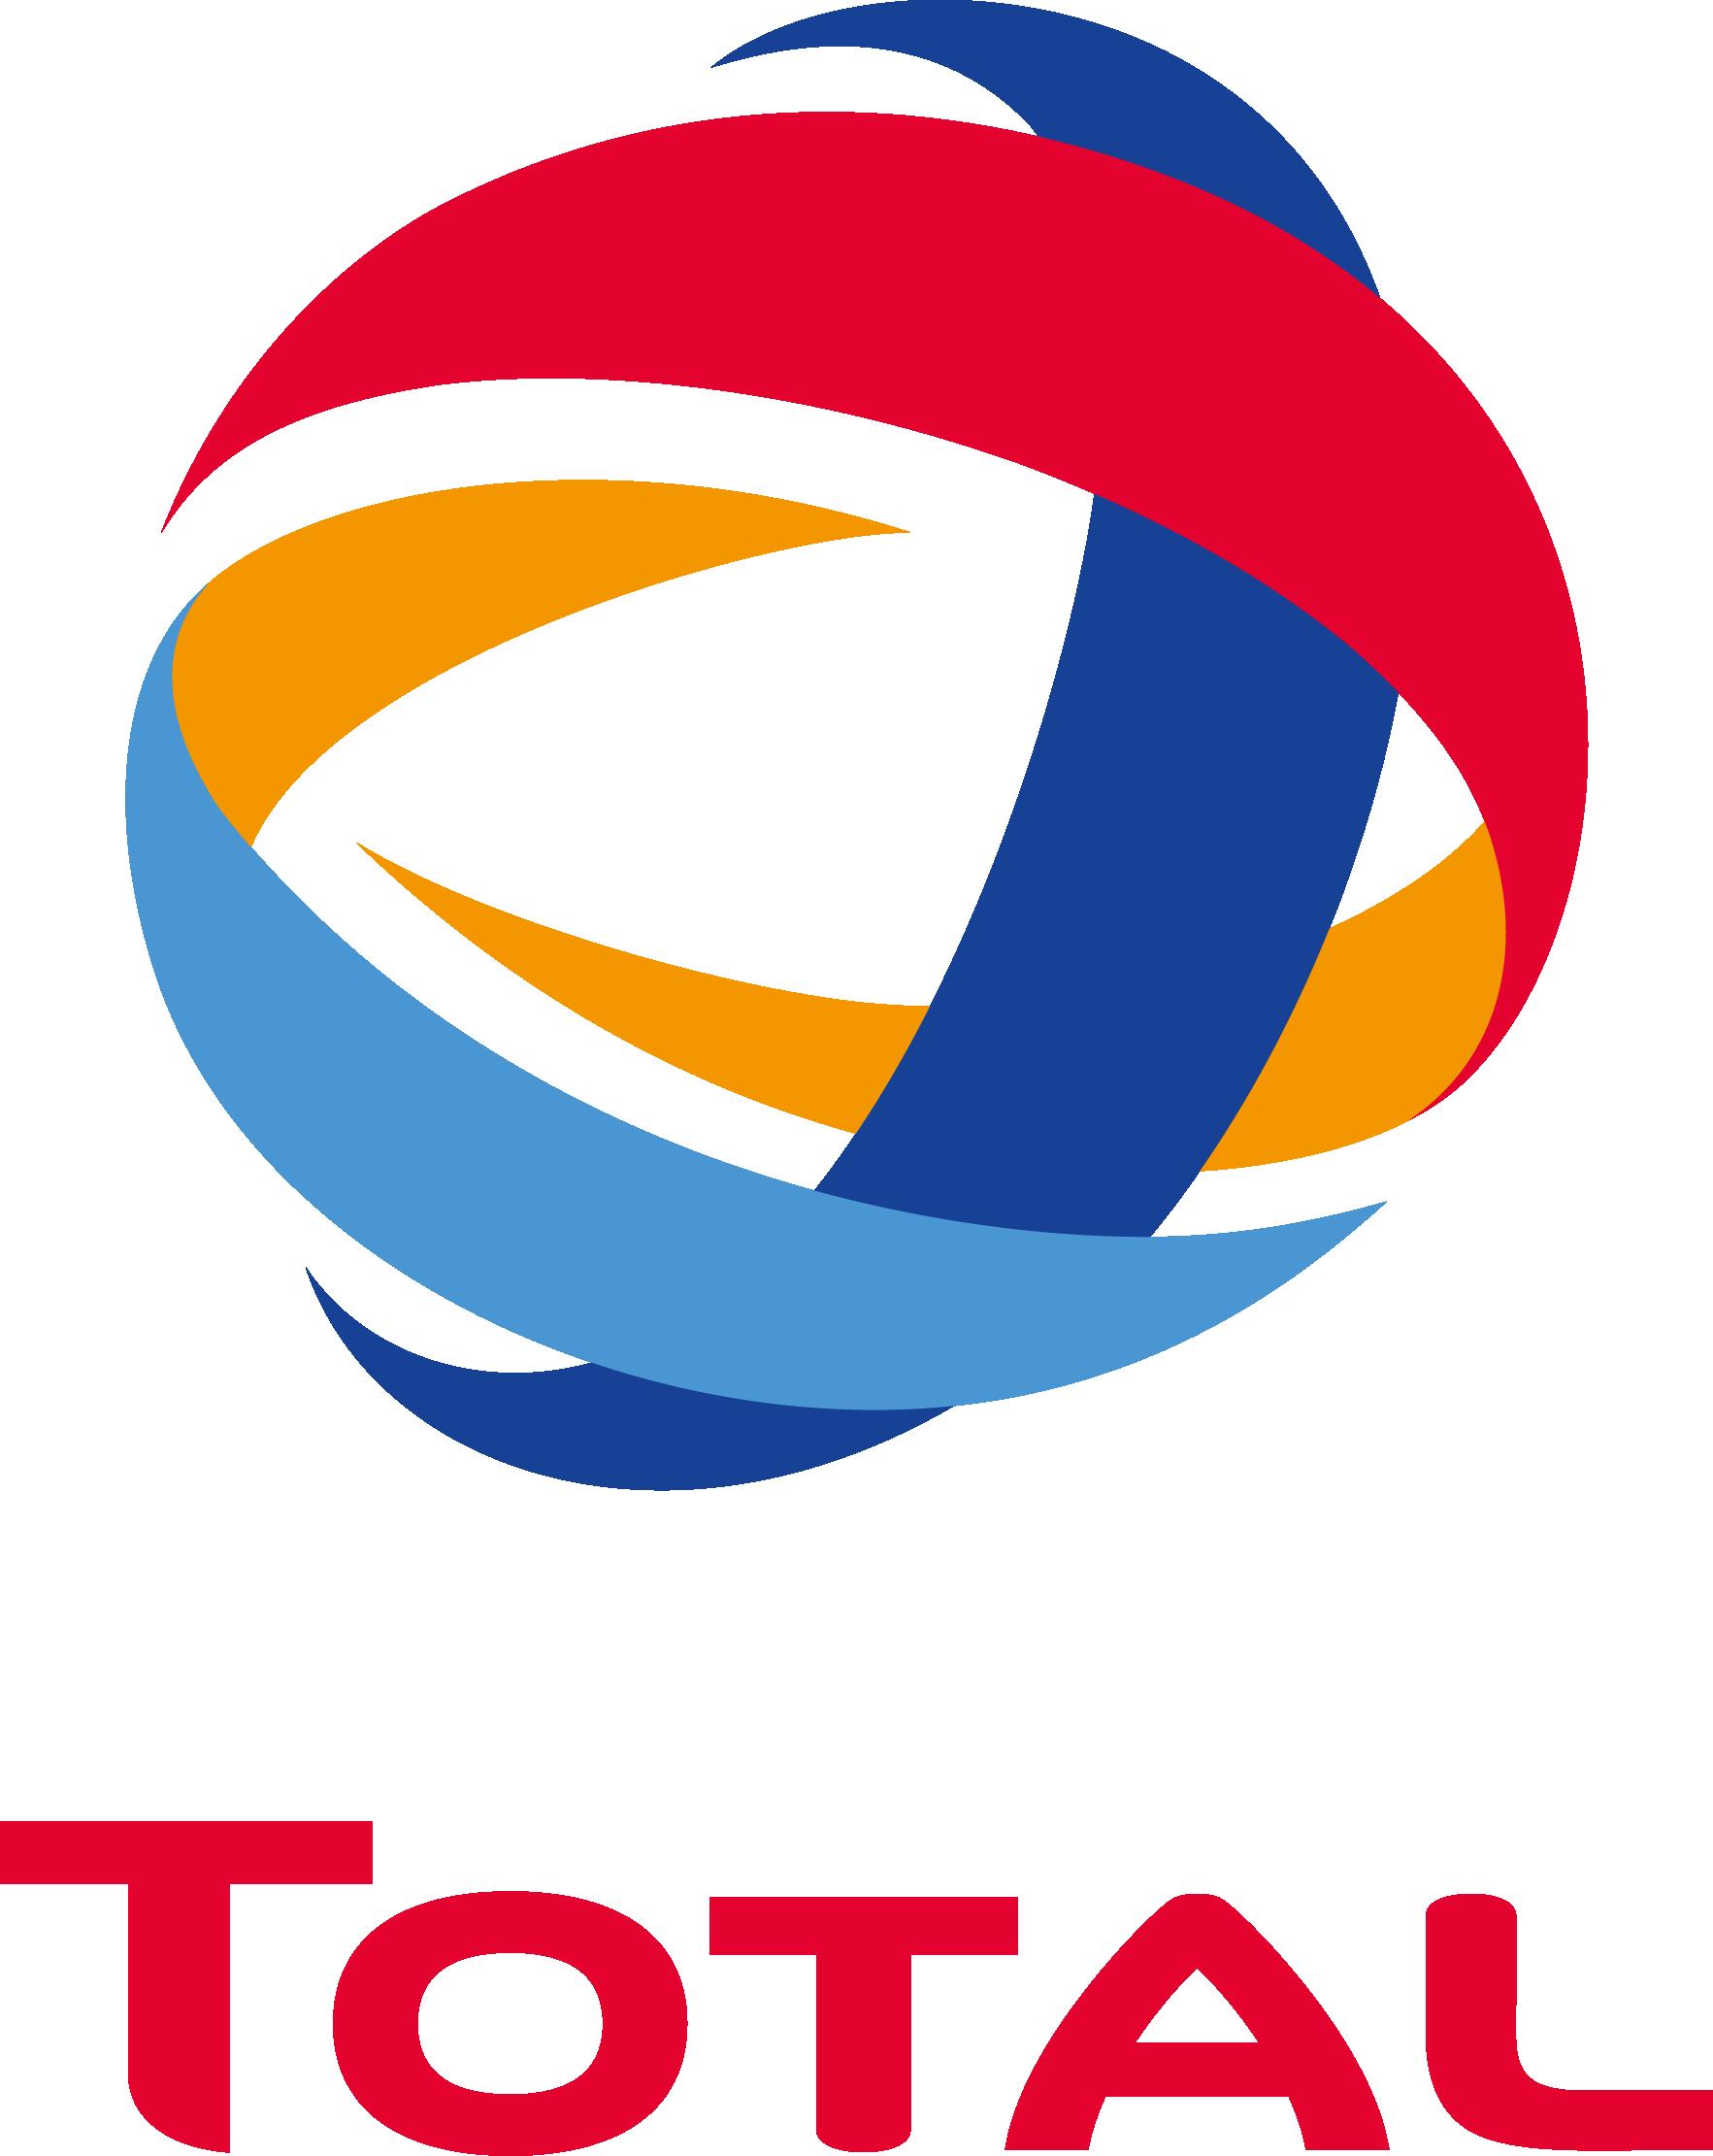 Total Logo PNG Transparent Total Logo.PNG Images. | PlusPNG